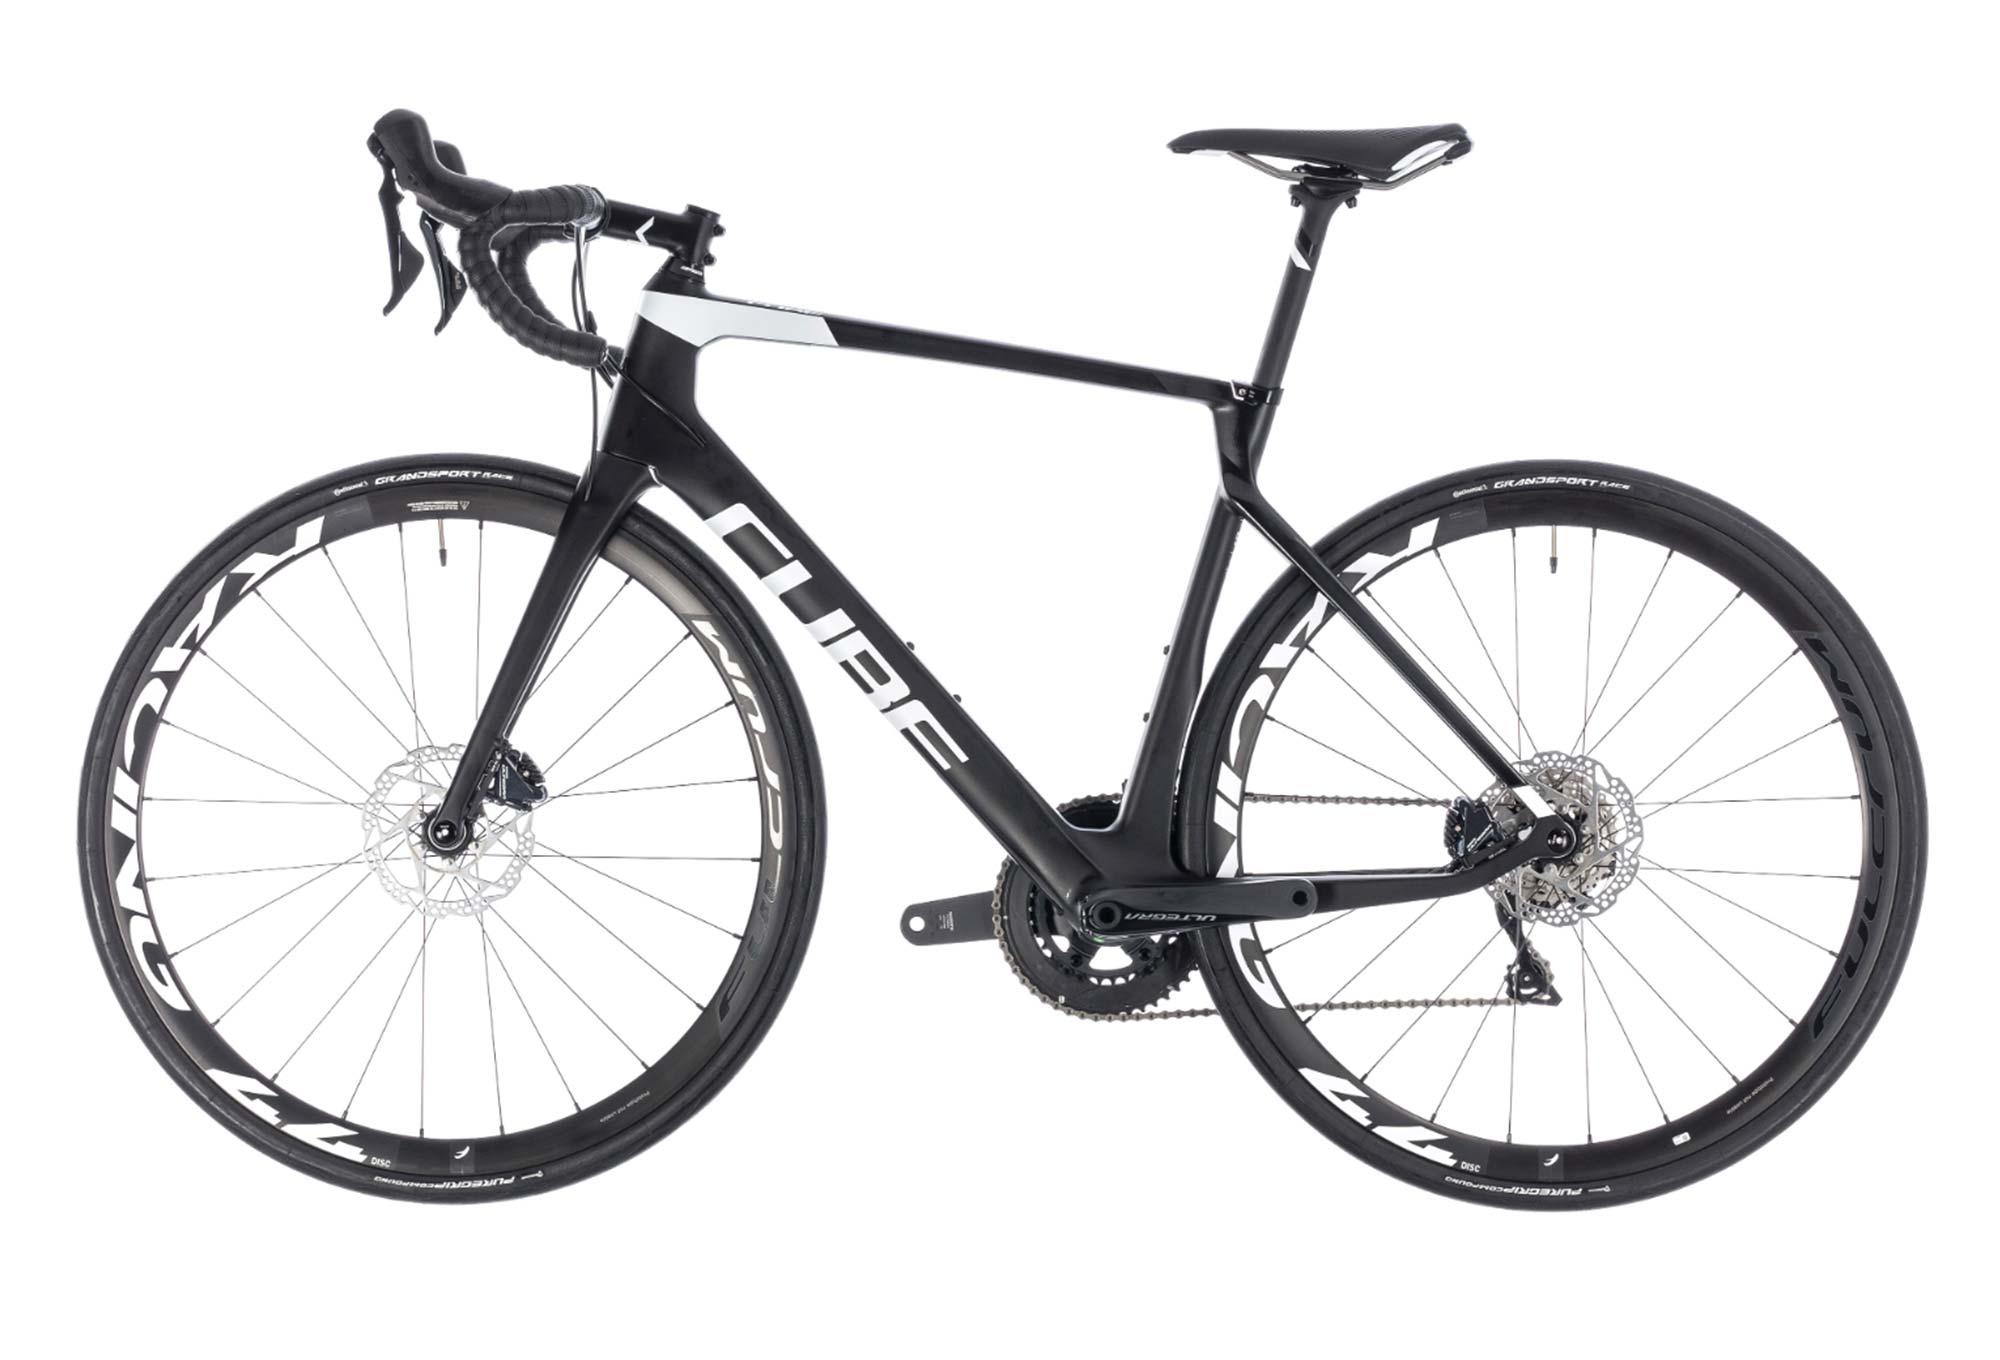 bfcddbf87934f7 Vélo de Route Cube Agree C 62 Race Disc Shimano Ultegra 11V Noir   Blanc  2018